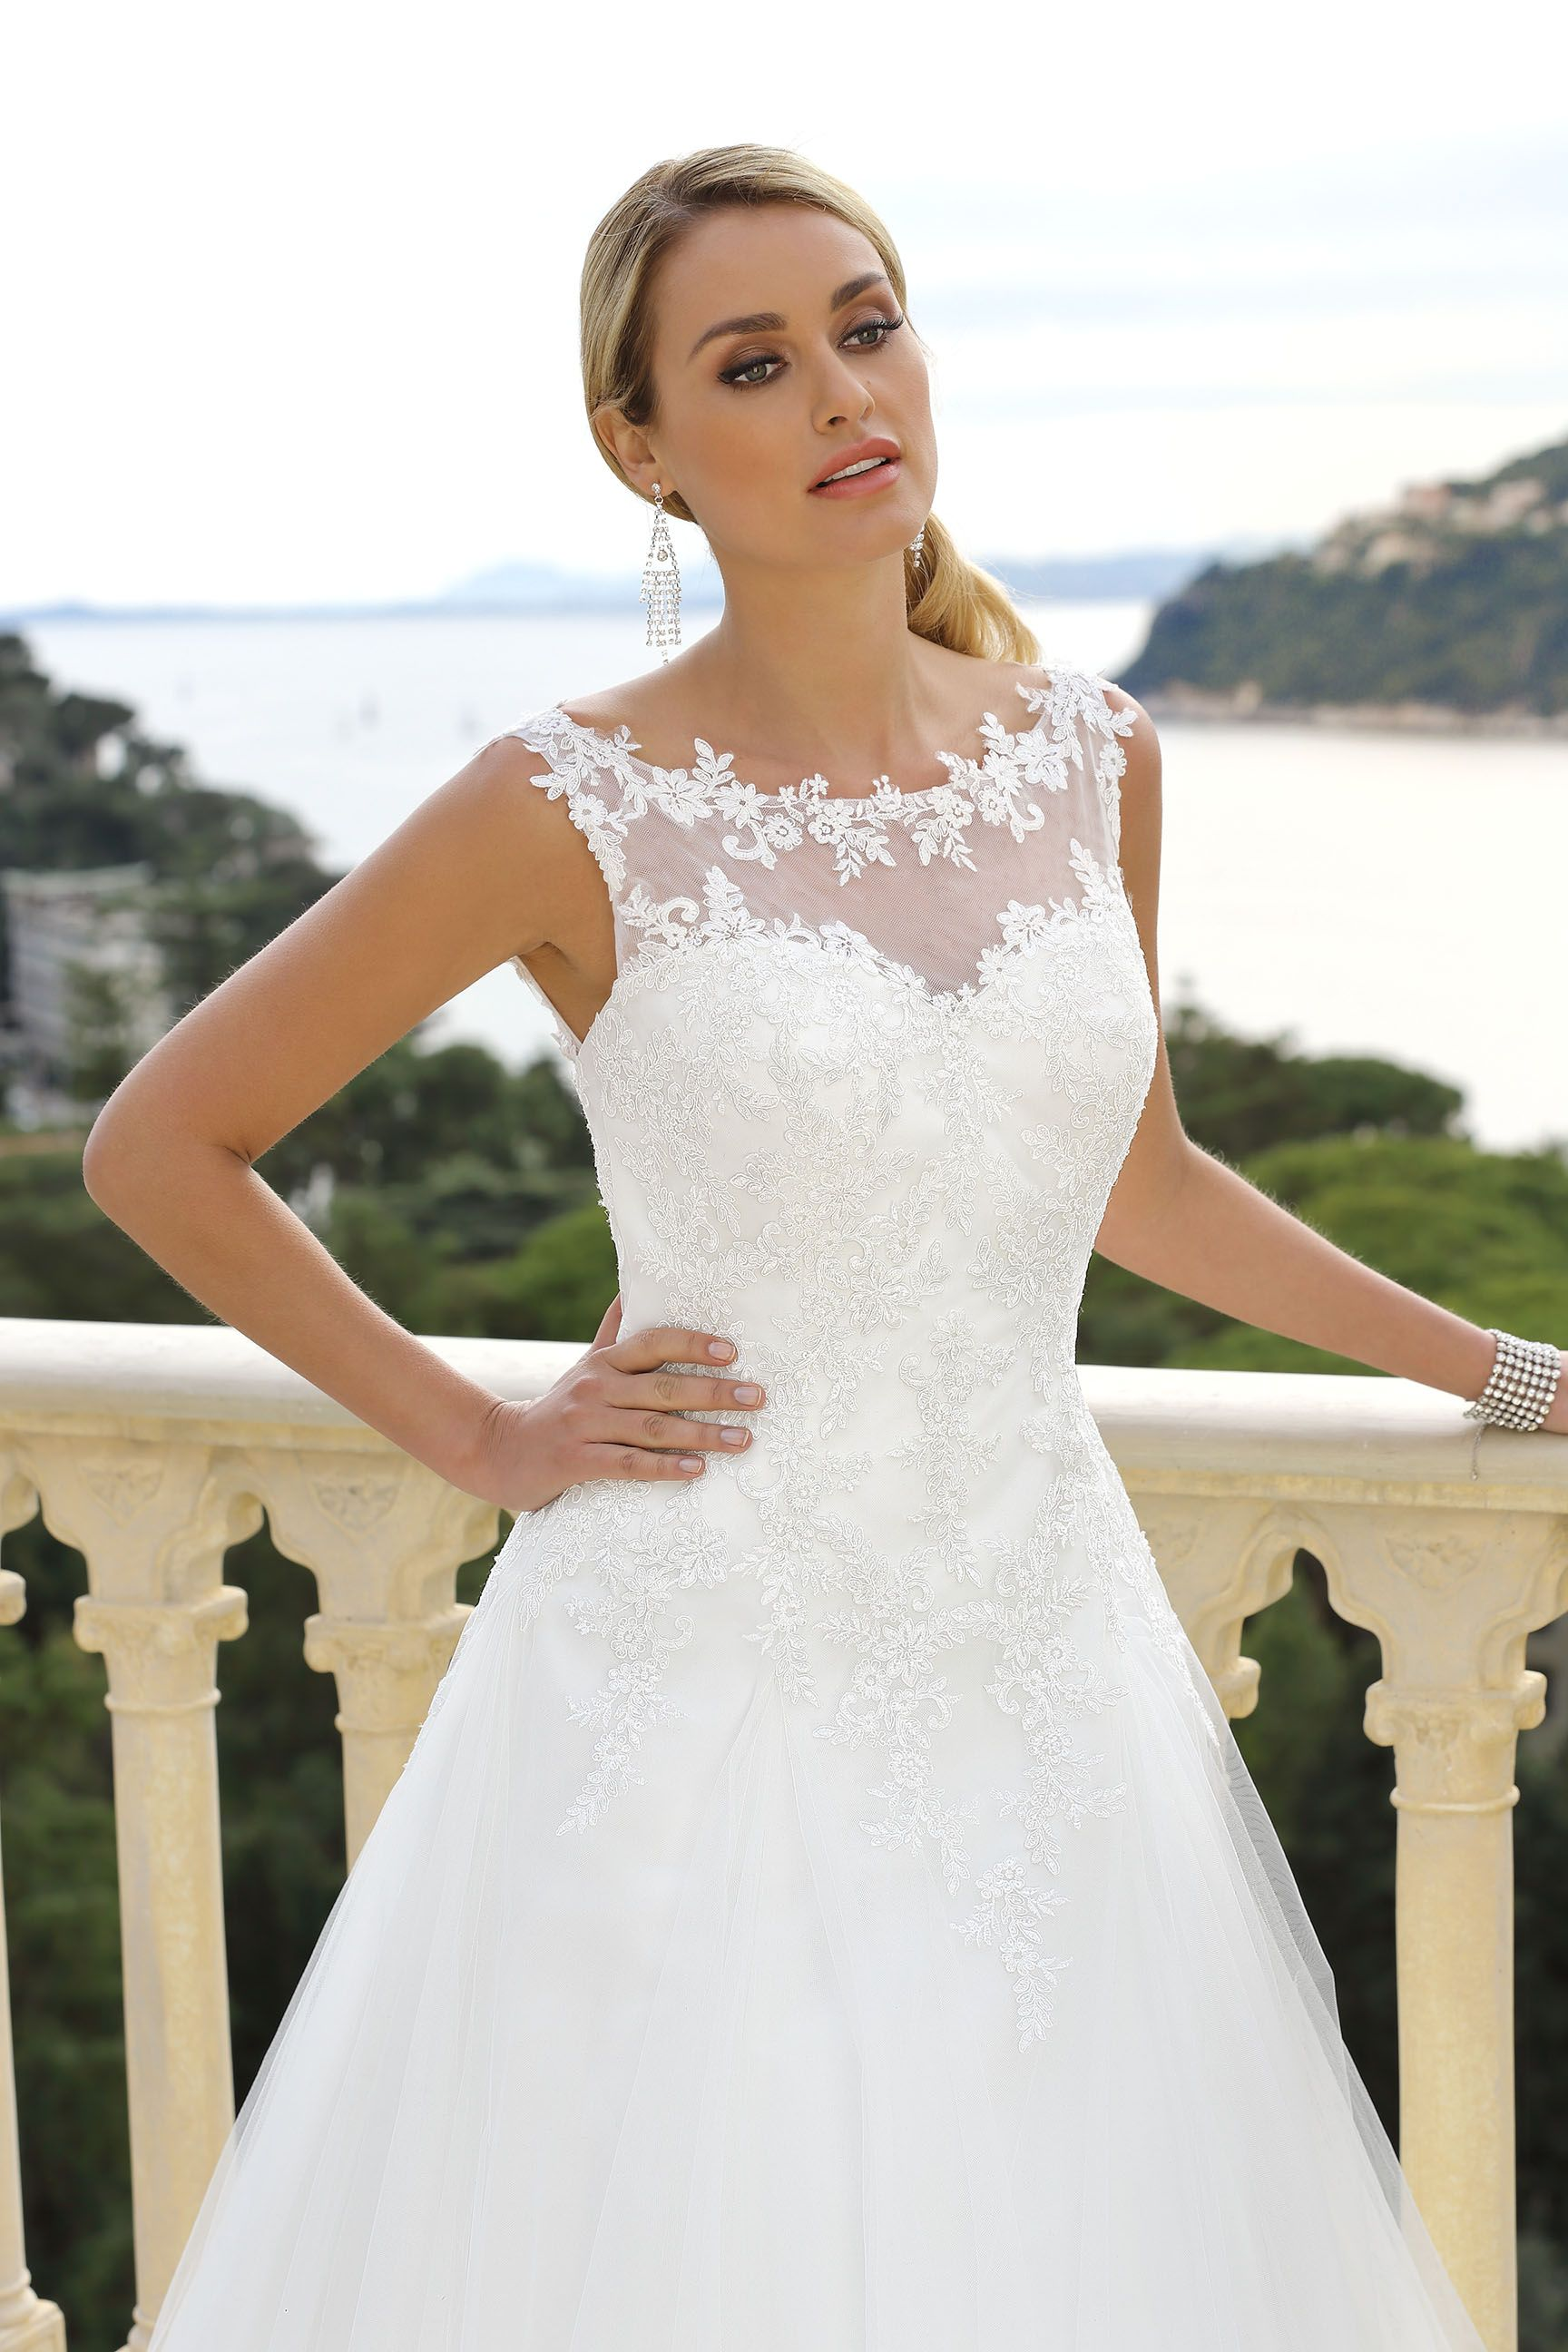 Ladybird Wedding Dress 316007 | brautstrauss | Pinterest | Brautsträuße